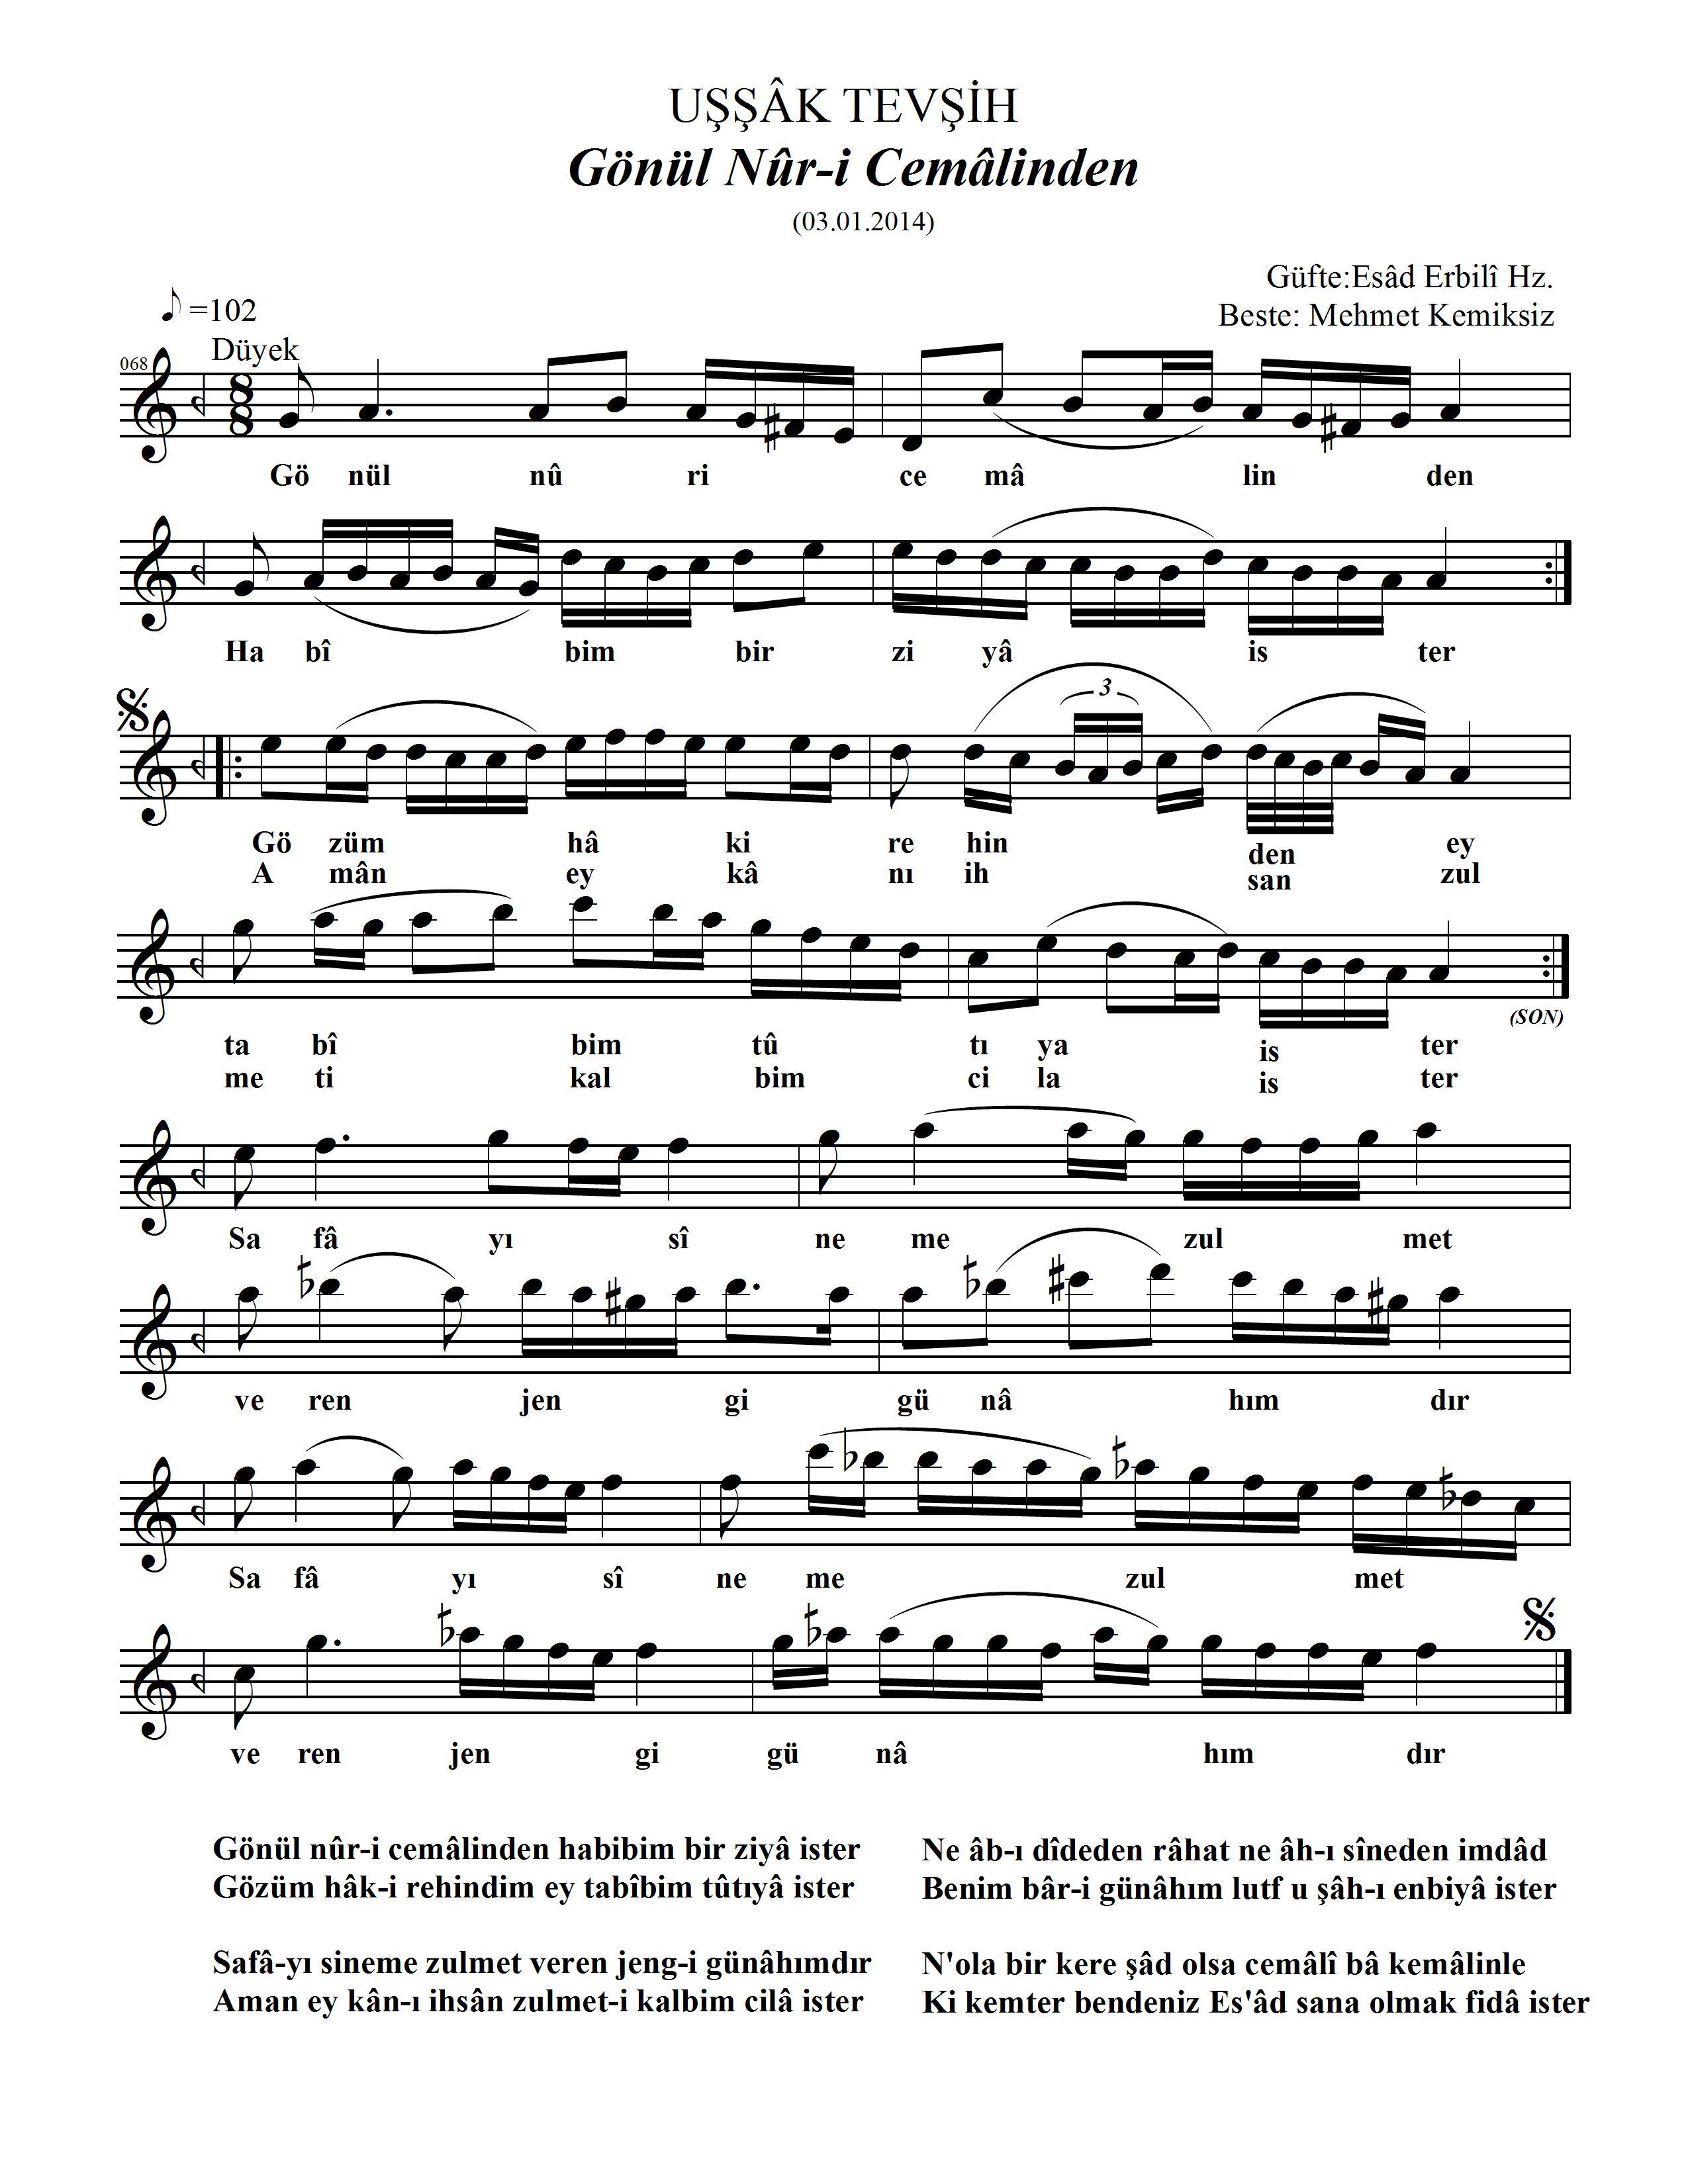 068-Ussak-Gonul Nuri Cemalinden